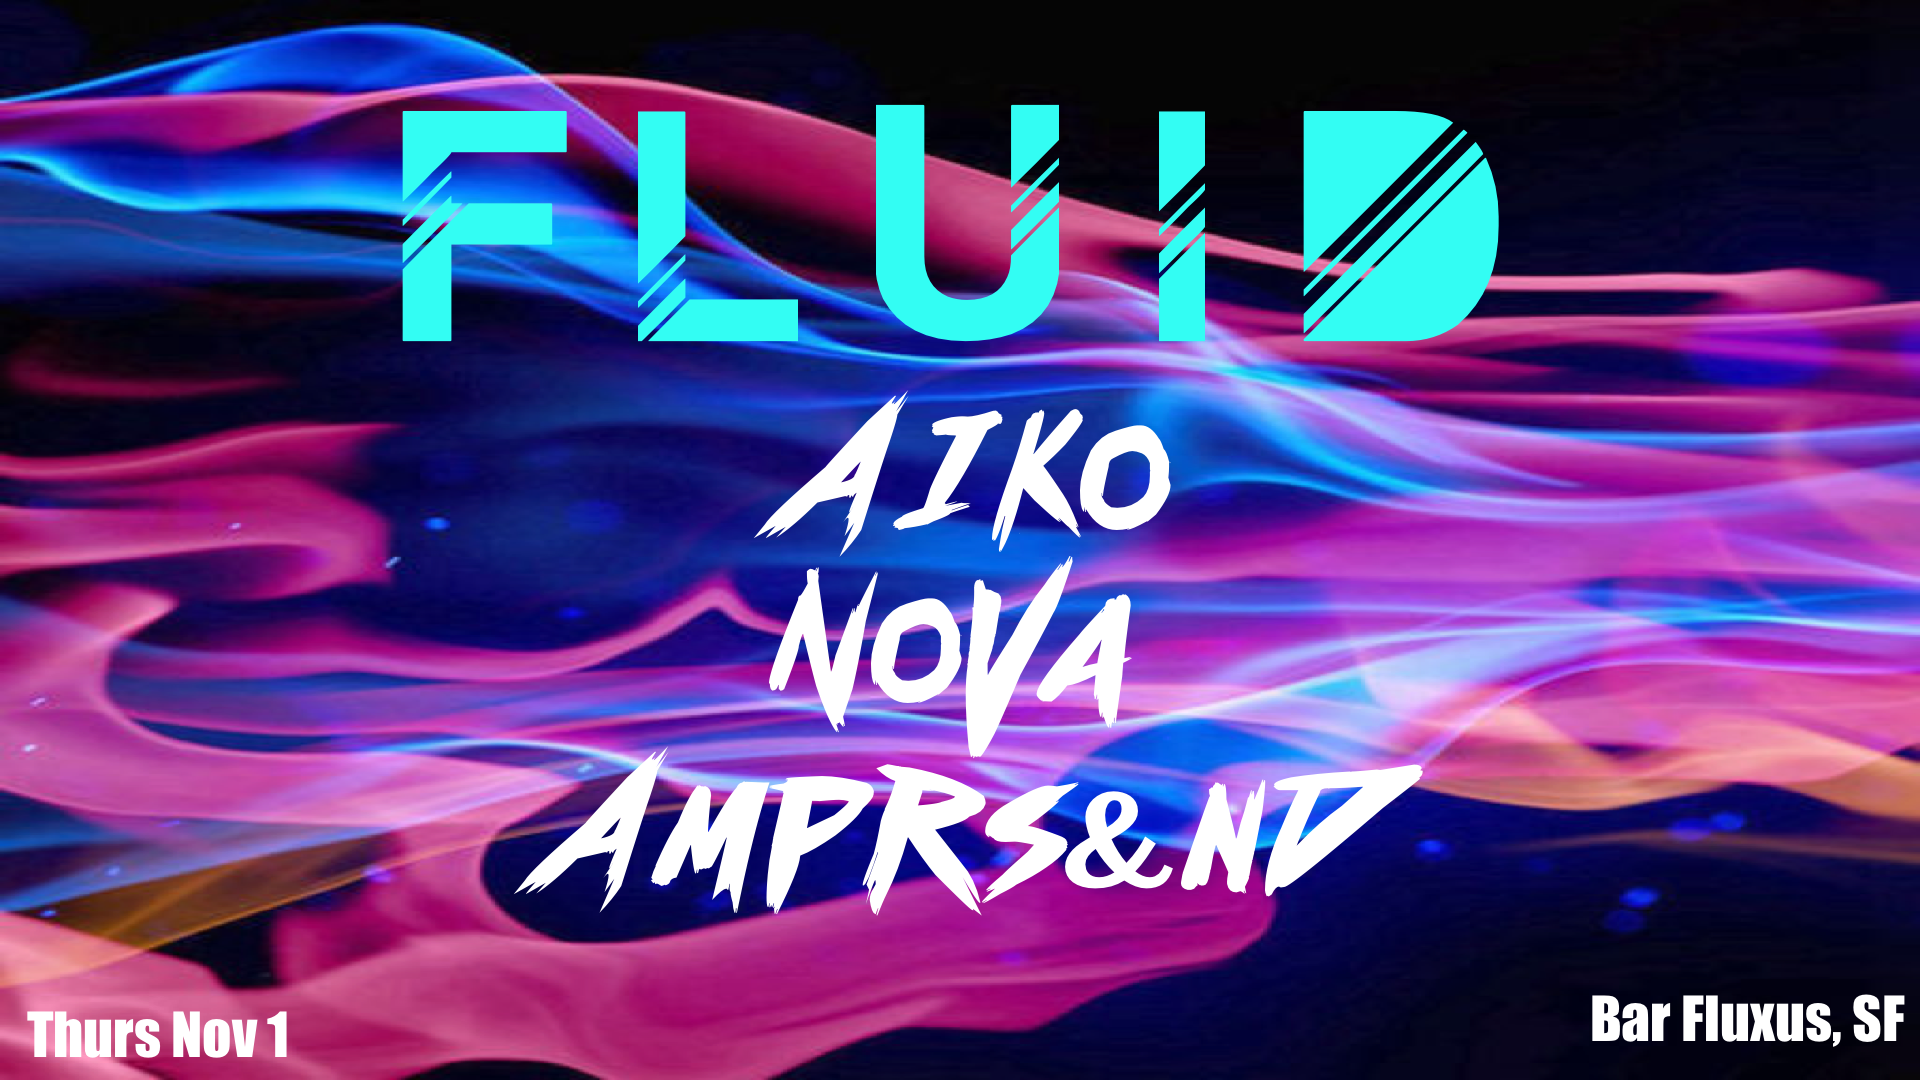 FLUID @ BAR FLUXUS - THURS. NOV 1 @ 10PM